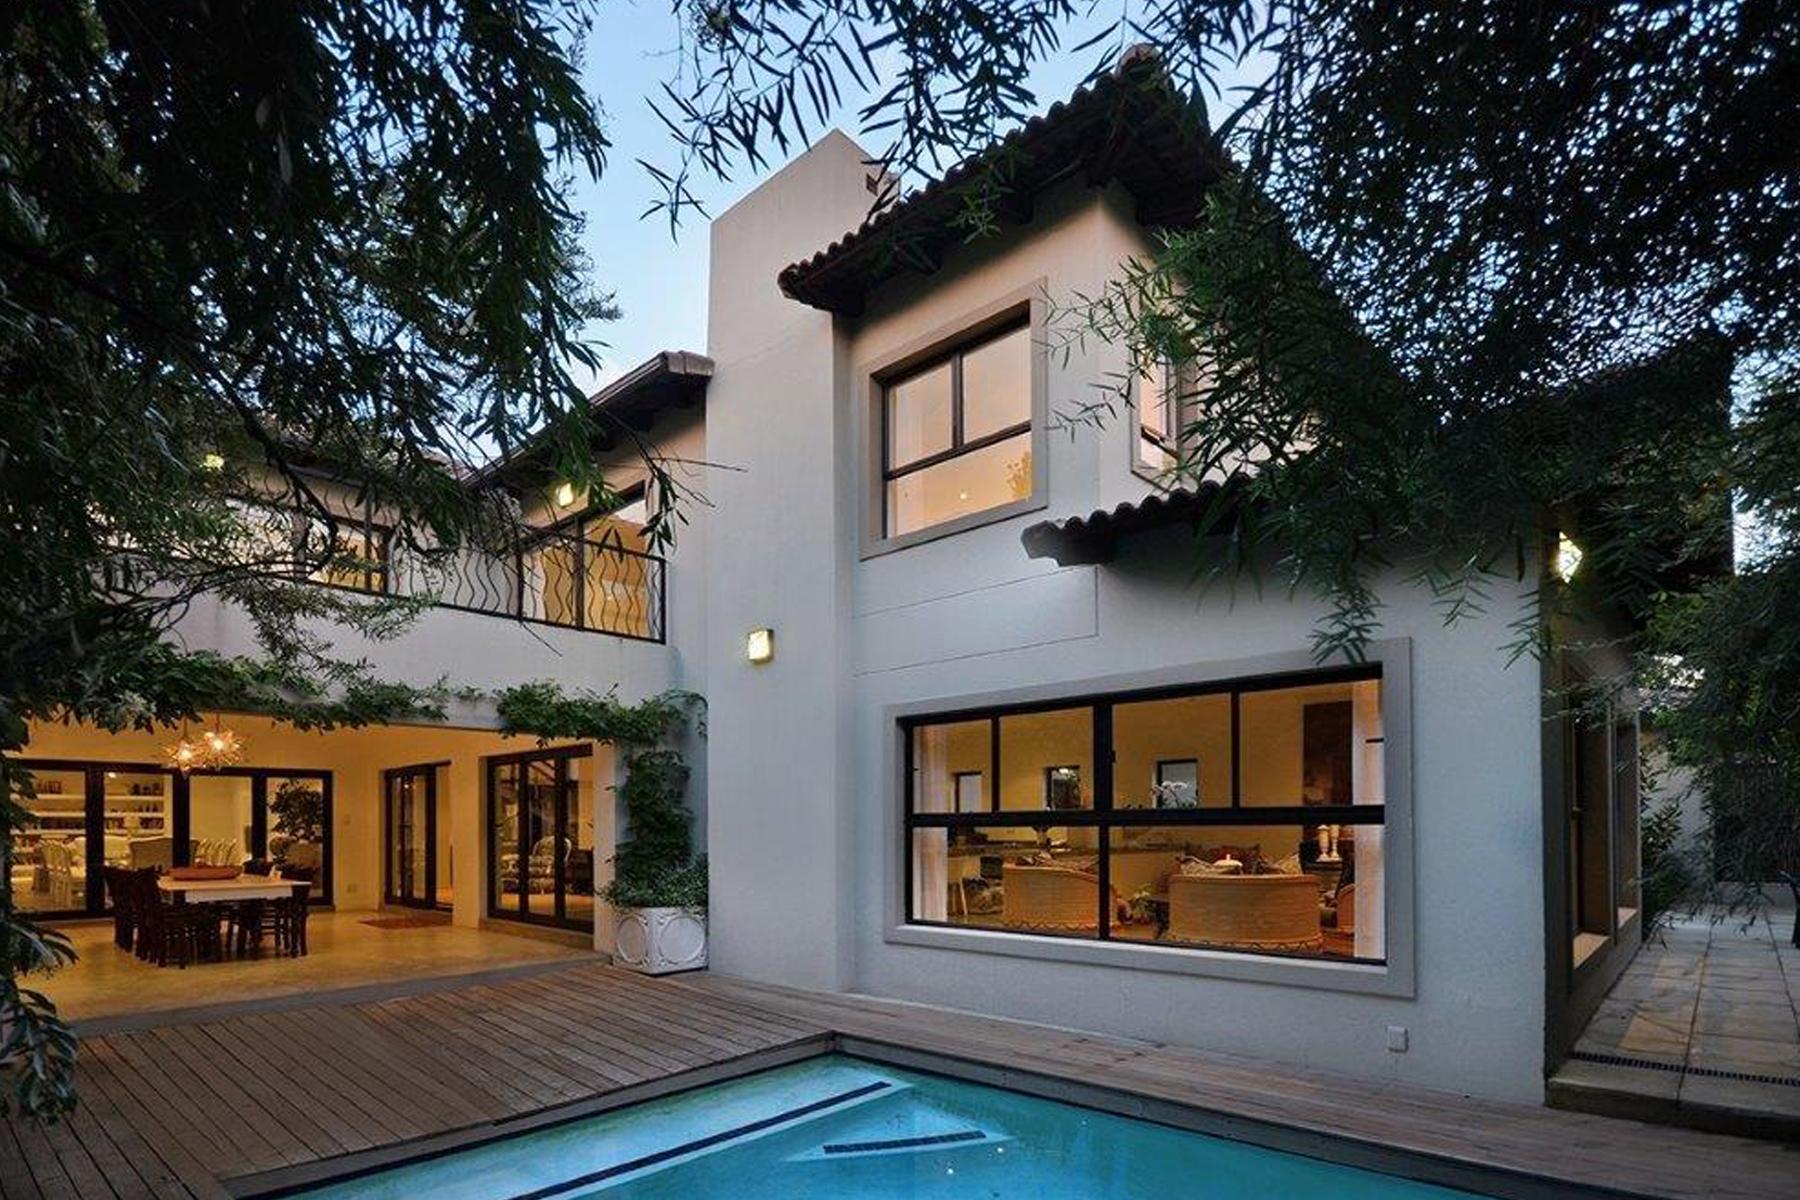 Single Family Home for Sale at Senderwood Johannesburg, Gauteng, 2007 South Africa